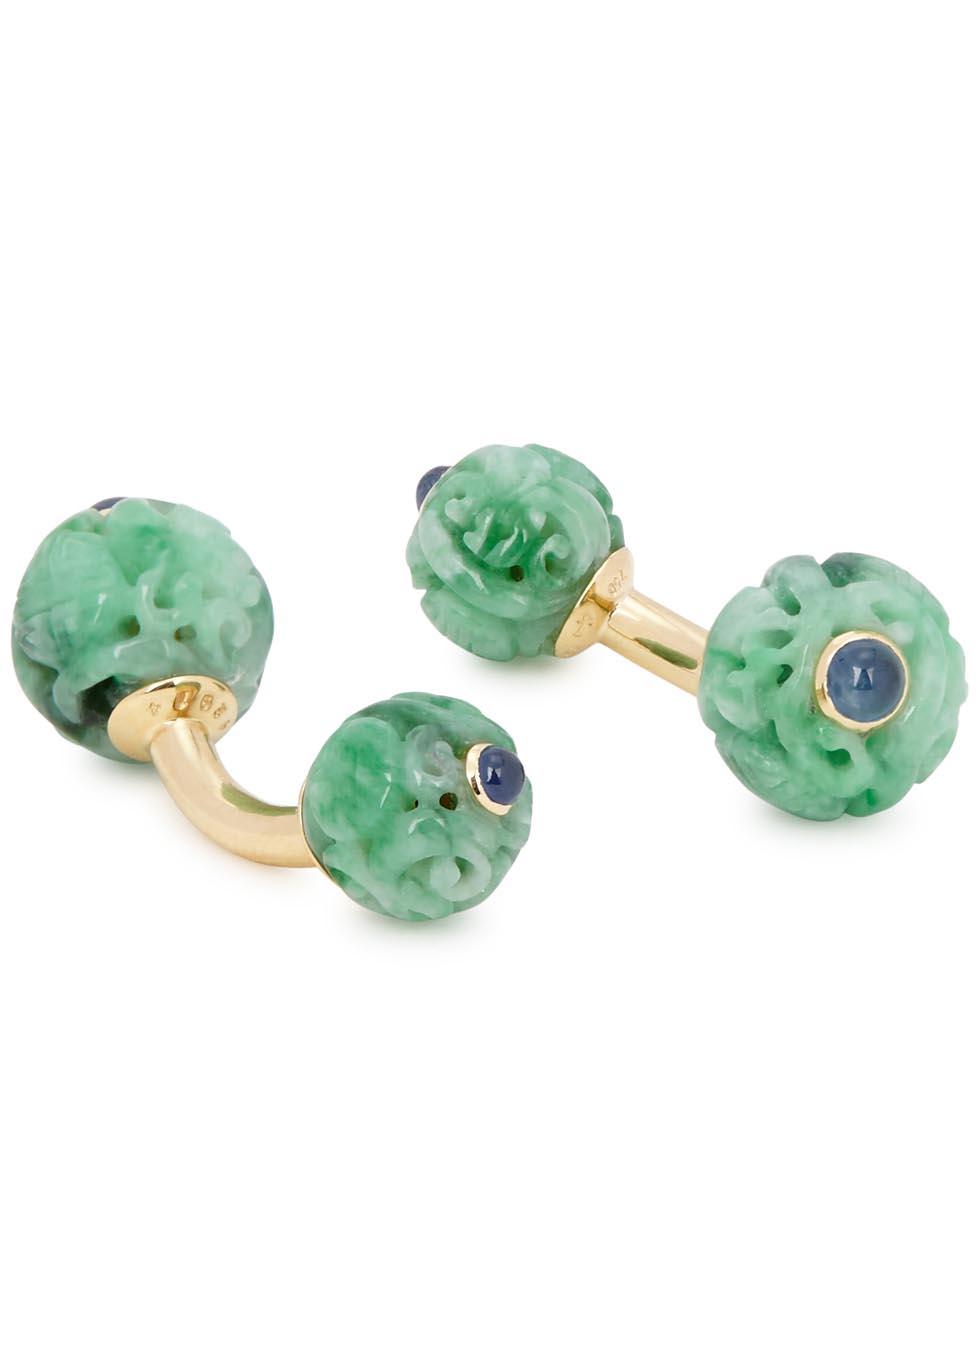 Canton jade 18kt gold-plated cufflinks - Trianon